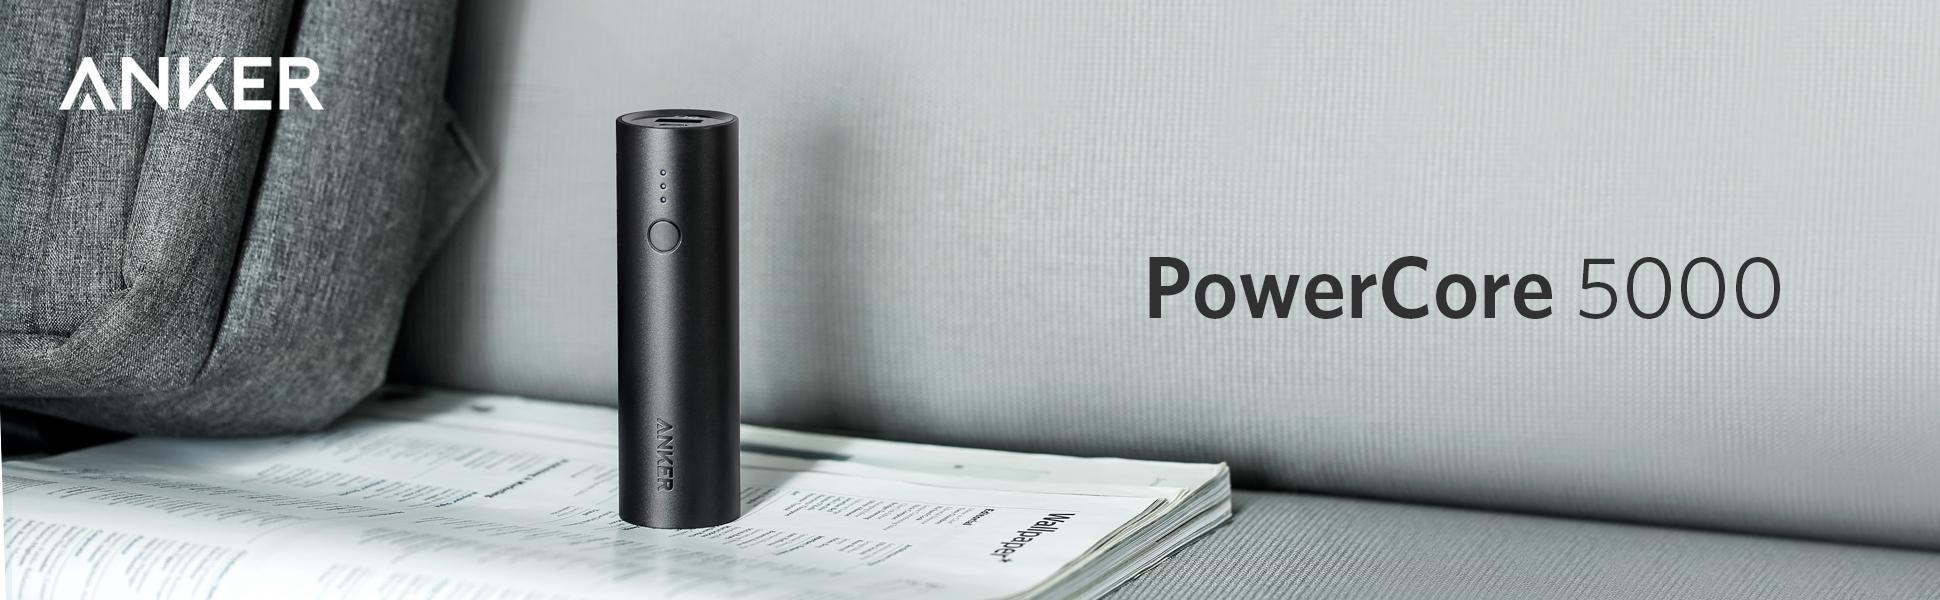 شاحن انكر PowerCore 5000